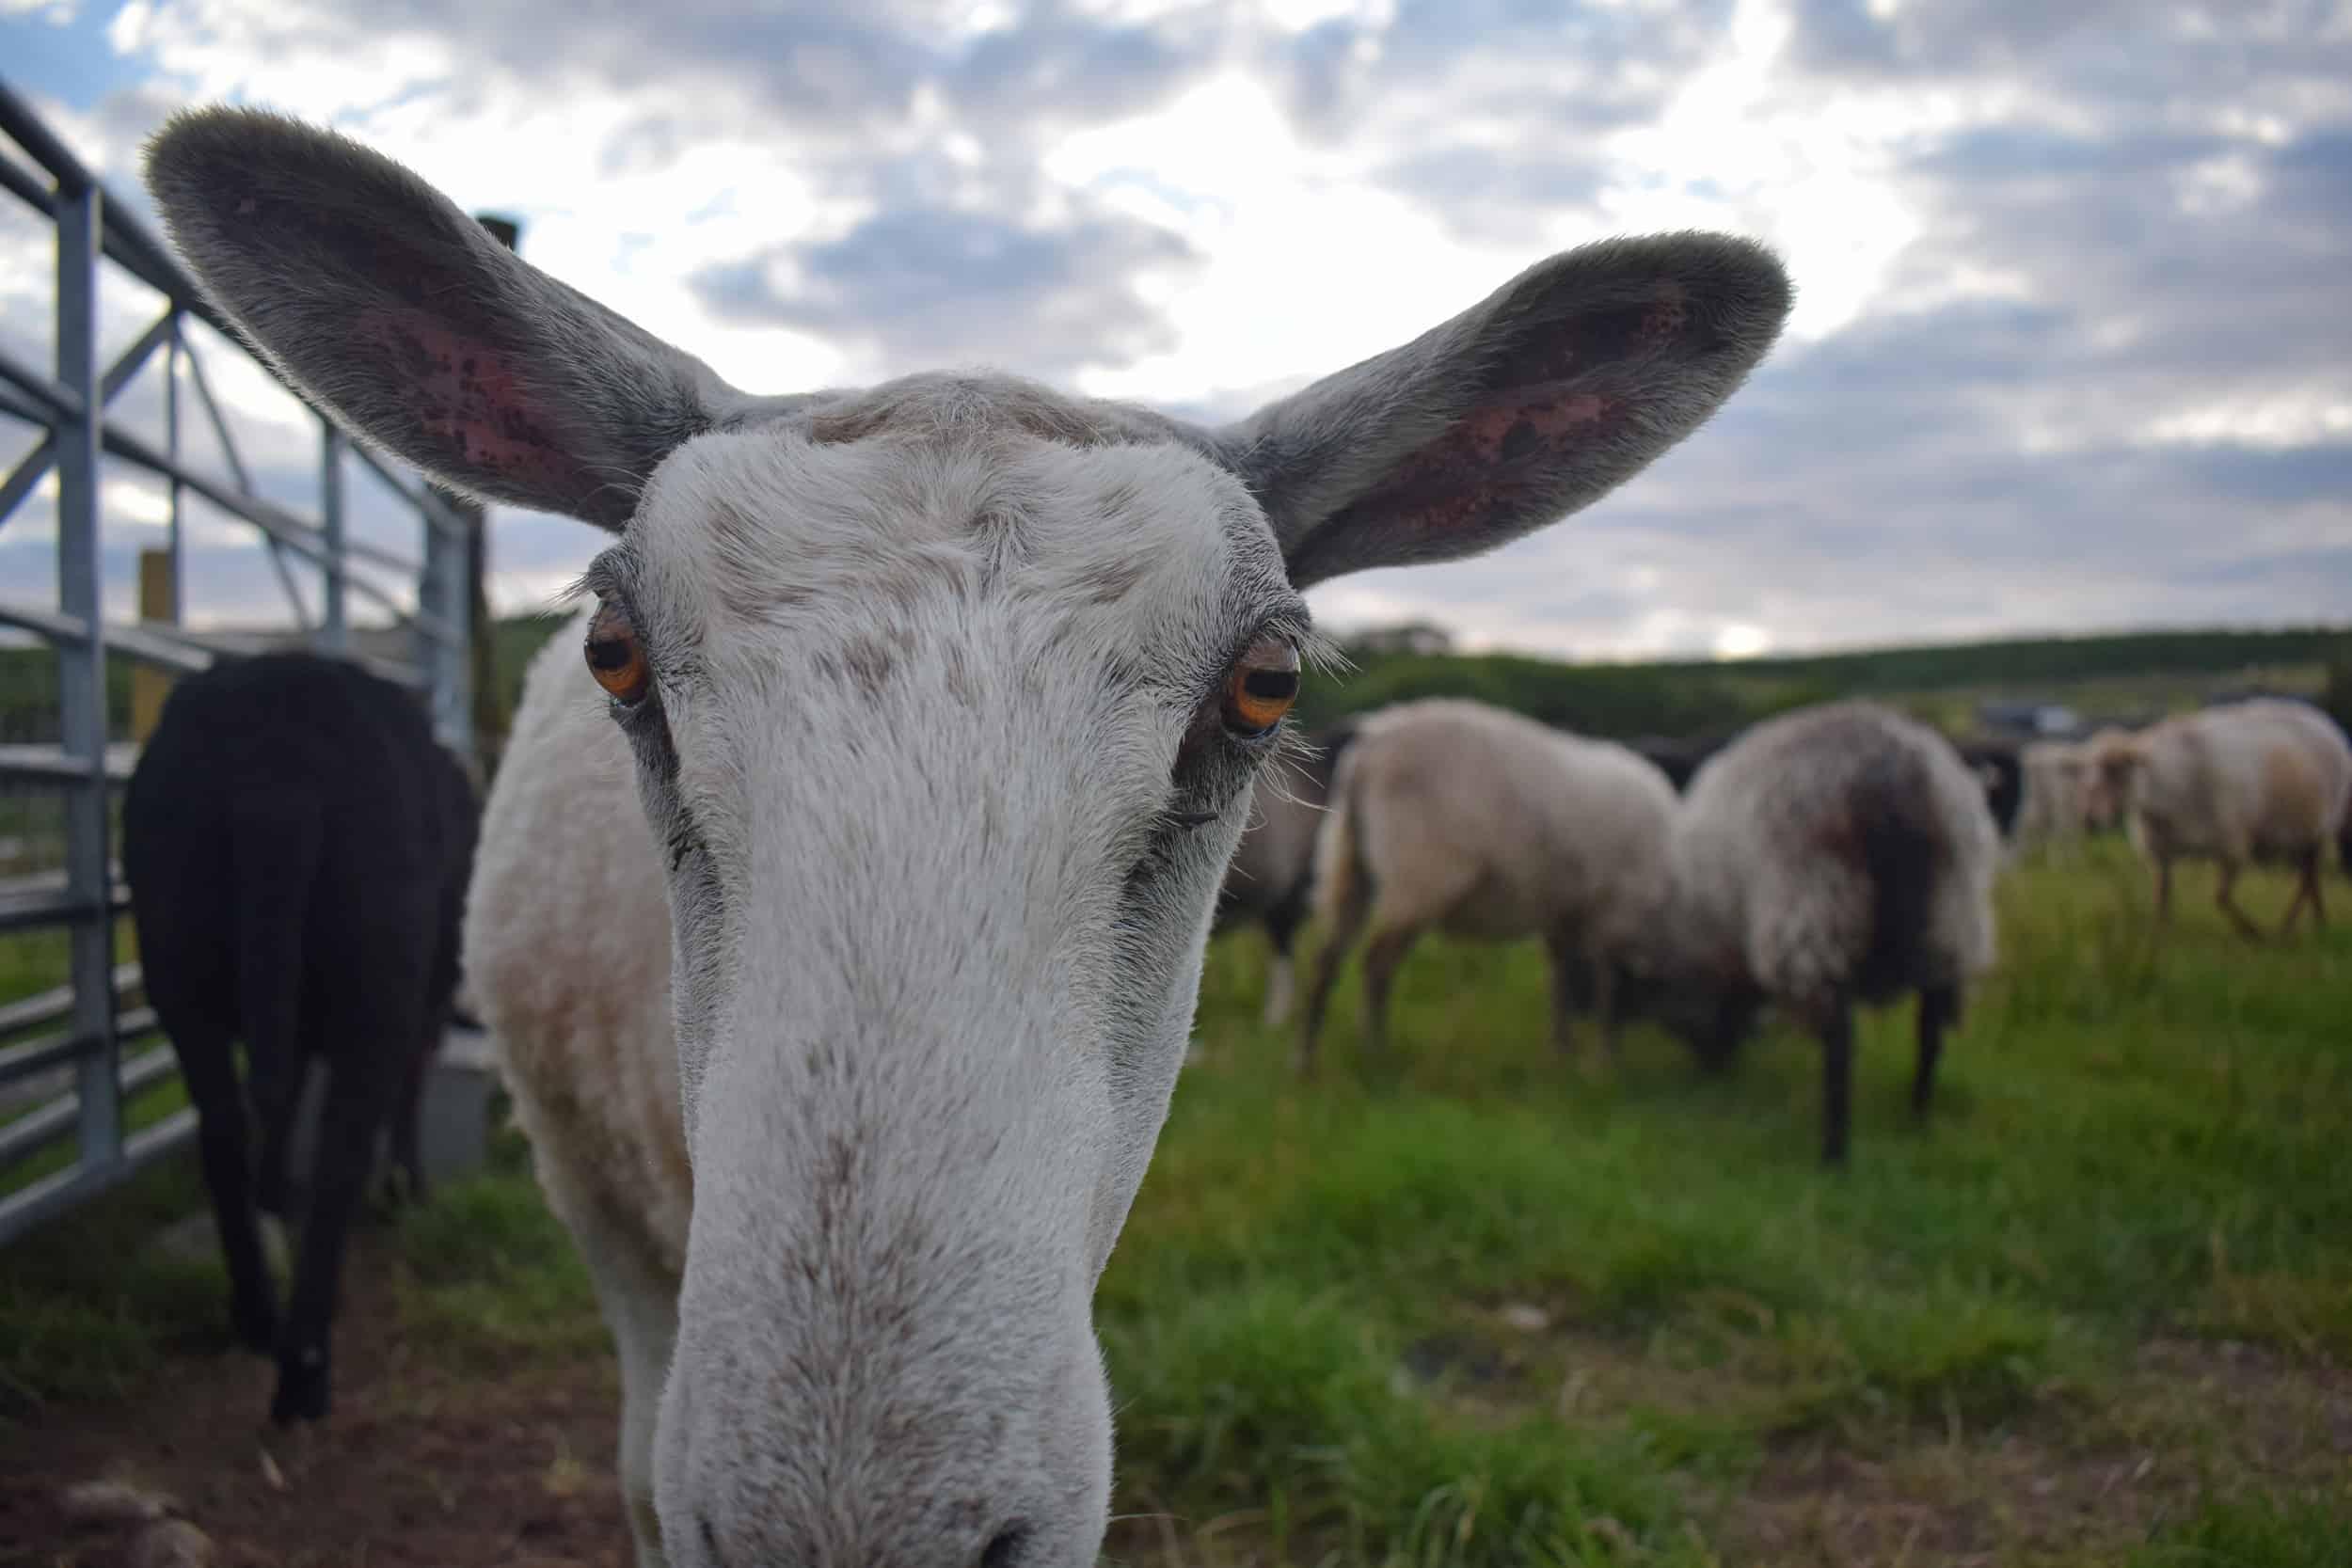 Lily bfl blueface leicester sheep ewe lamb pet bottle baby lamb big ears